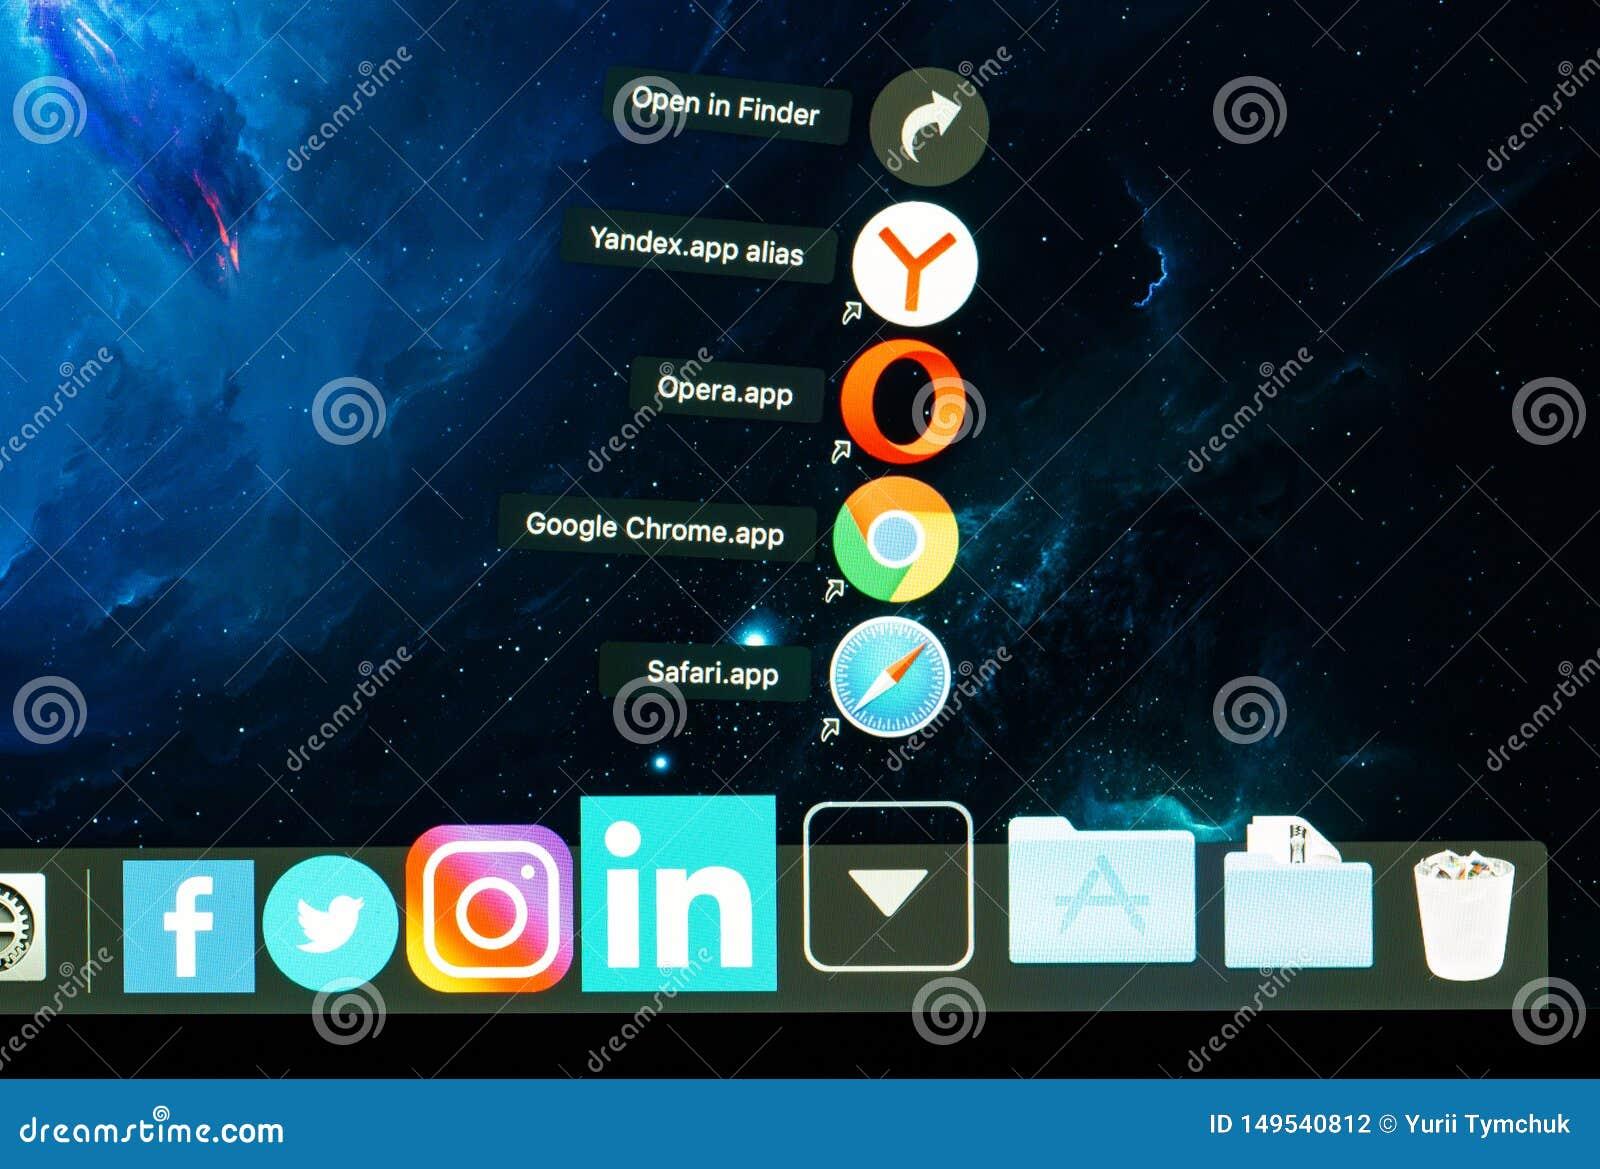 Closeup Shot Of Browsers Icons: Safari, Google Chrome, Opera